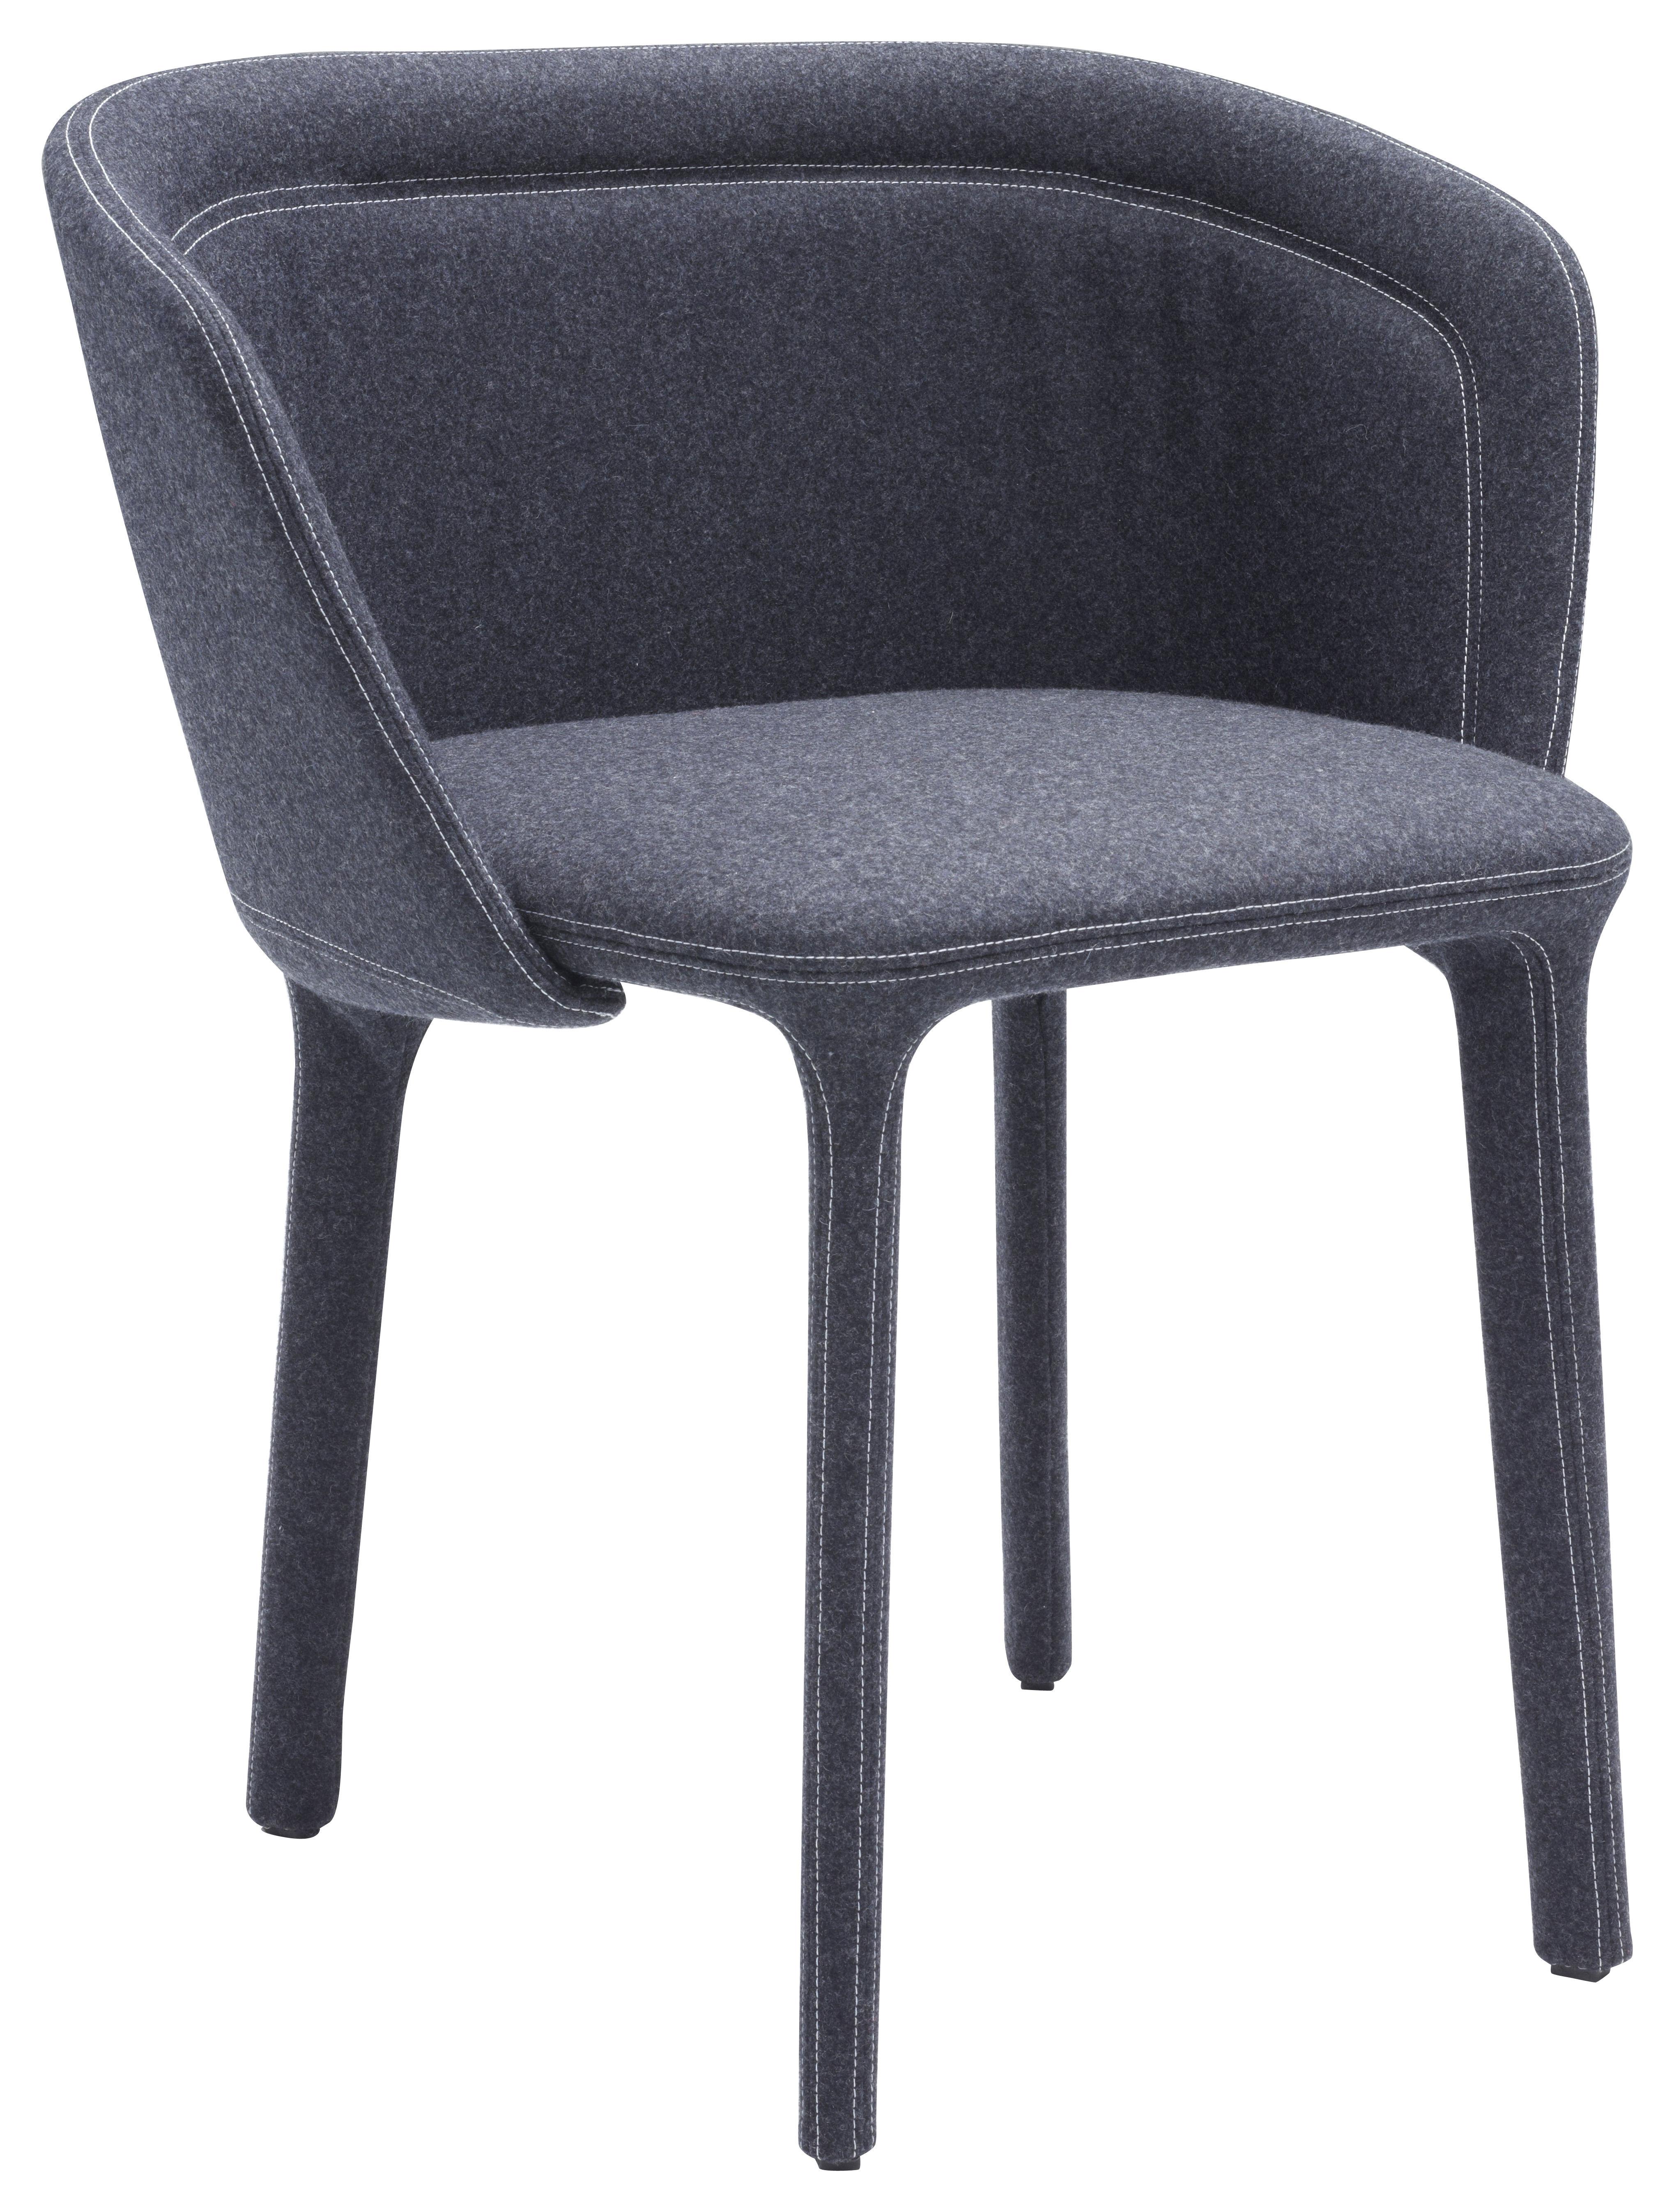 Möbel - Stühle  - Lepel Gepolsterter Sessel / Stoffbezug - Casamania - Stoff